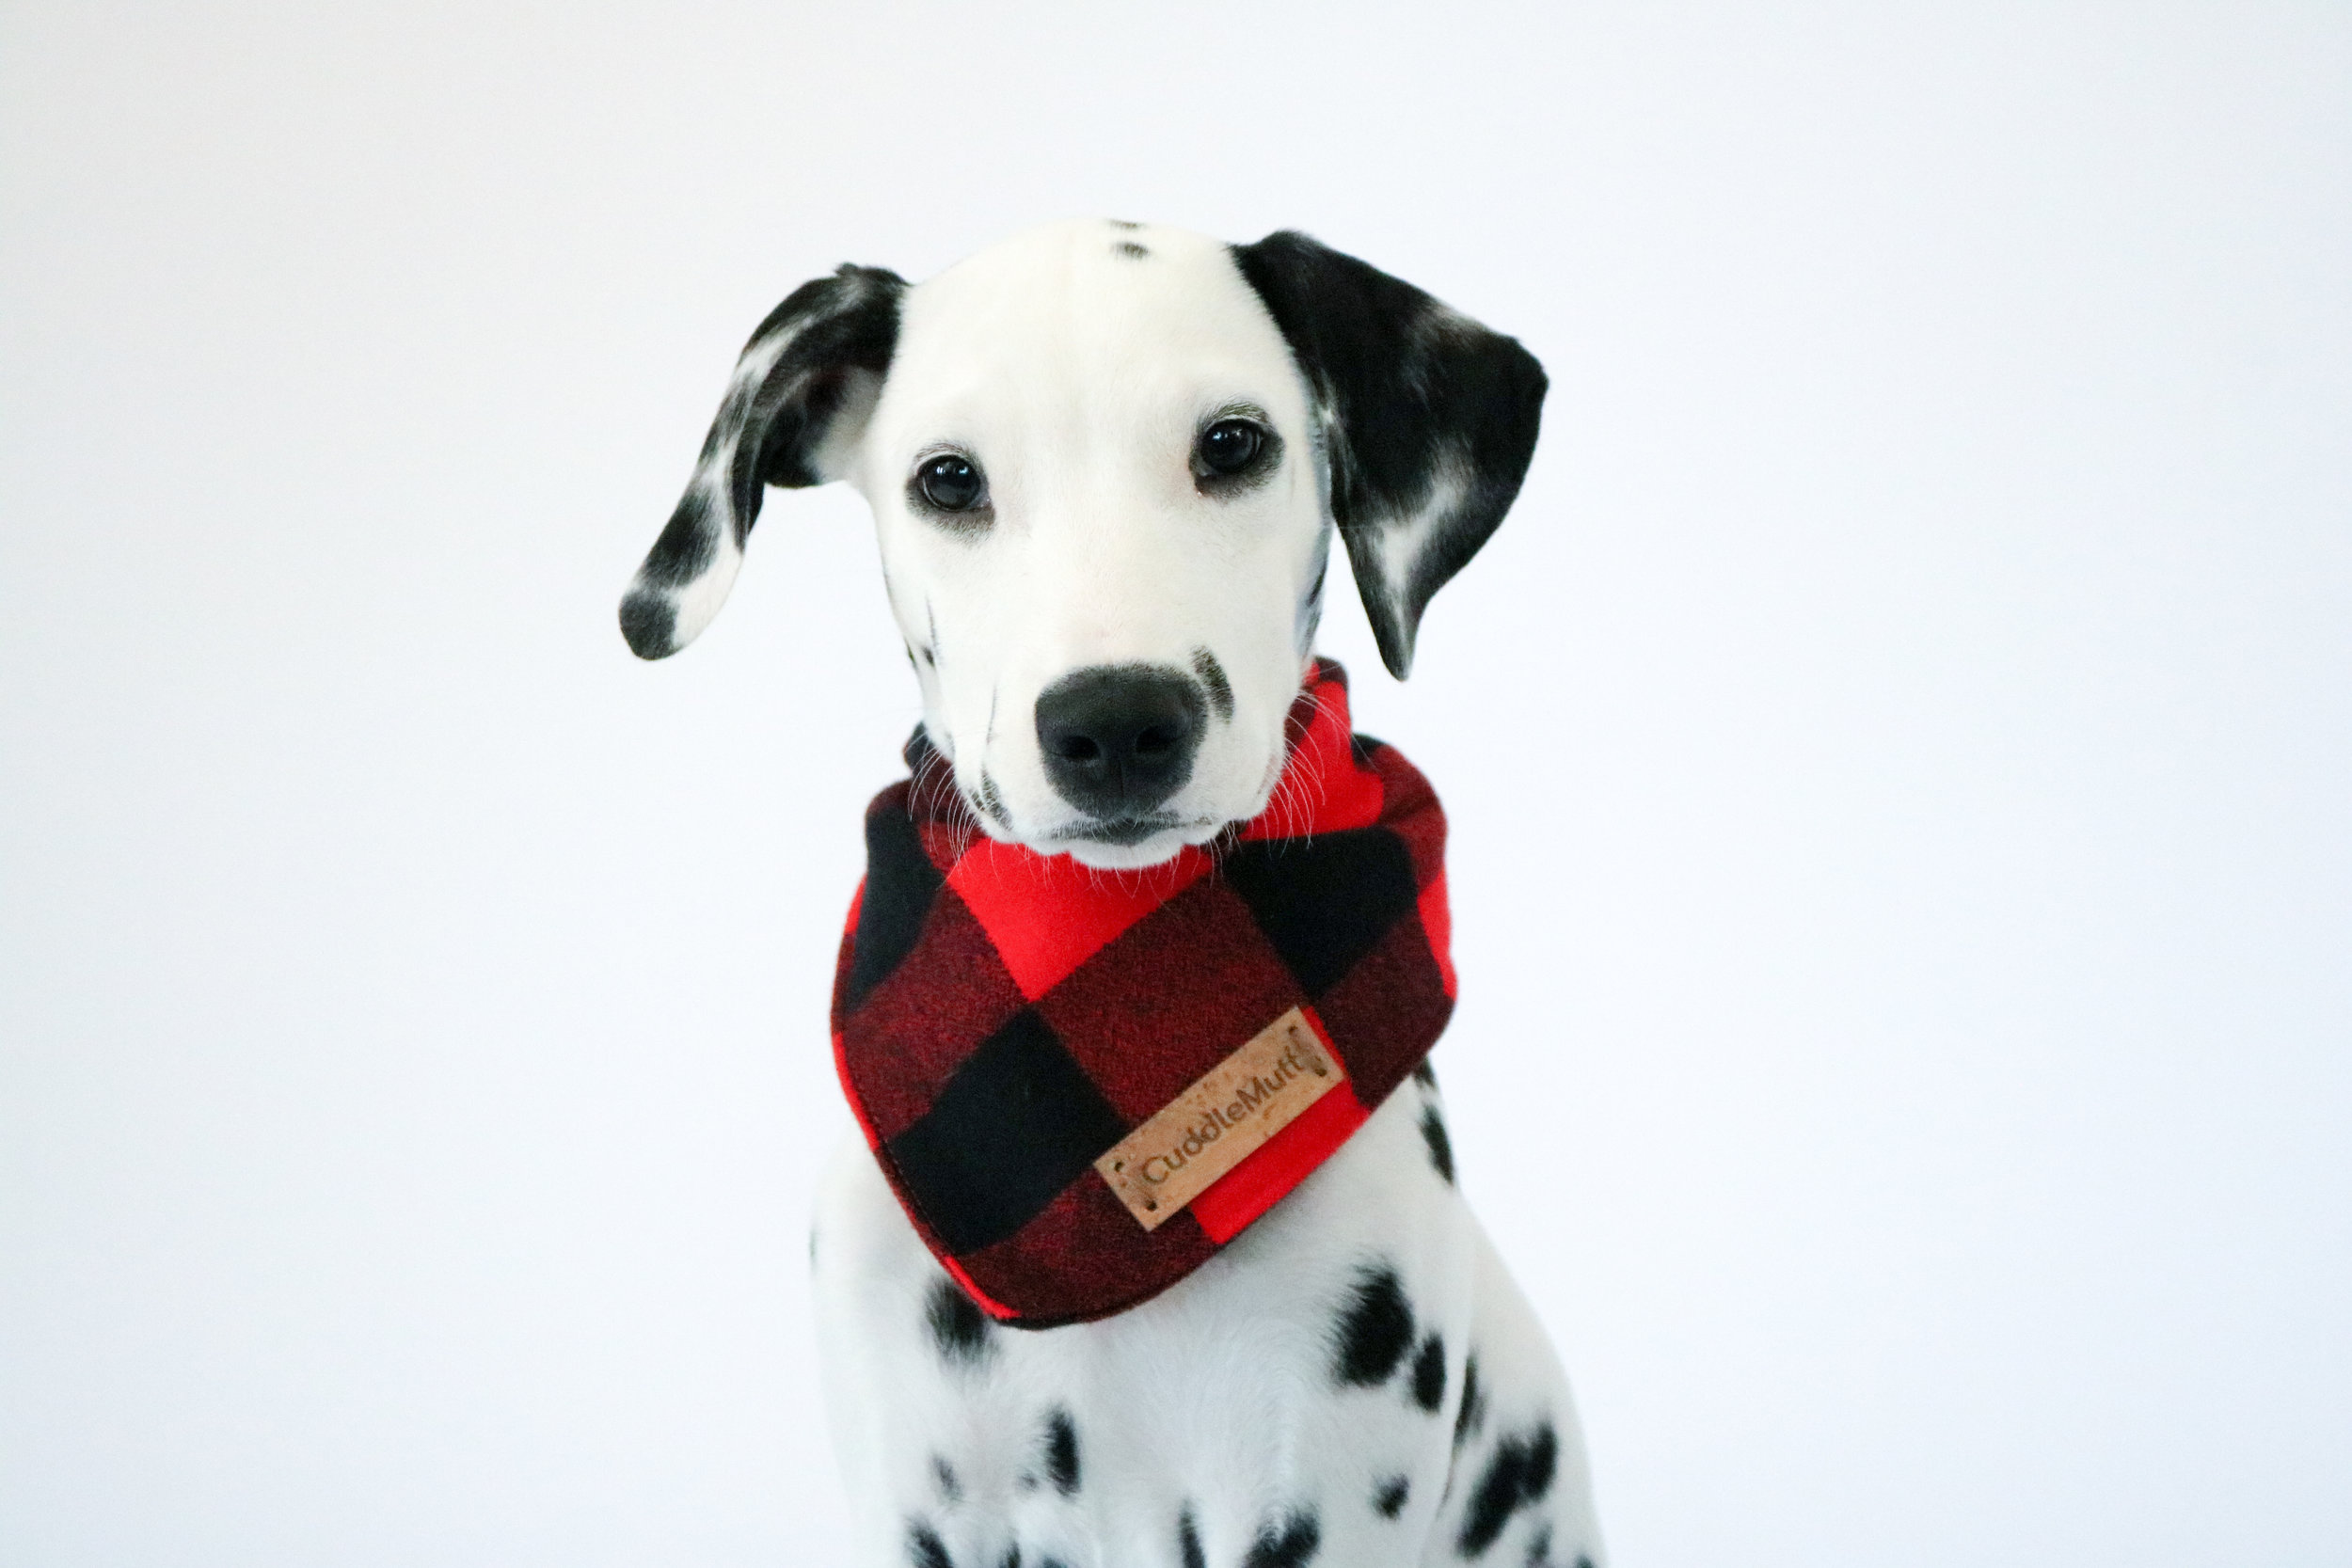 cuddlemutt Kristen Farris dogs accessories founder girlboss black friday product maia community werule we rule